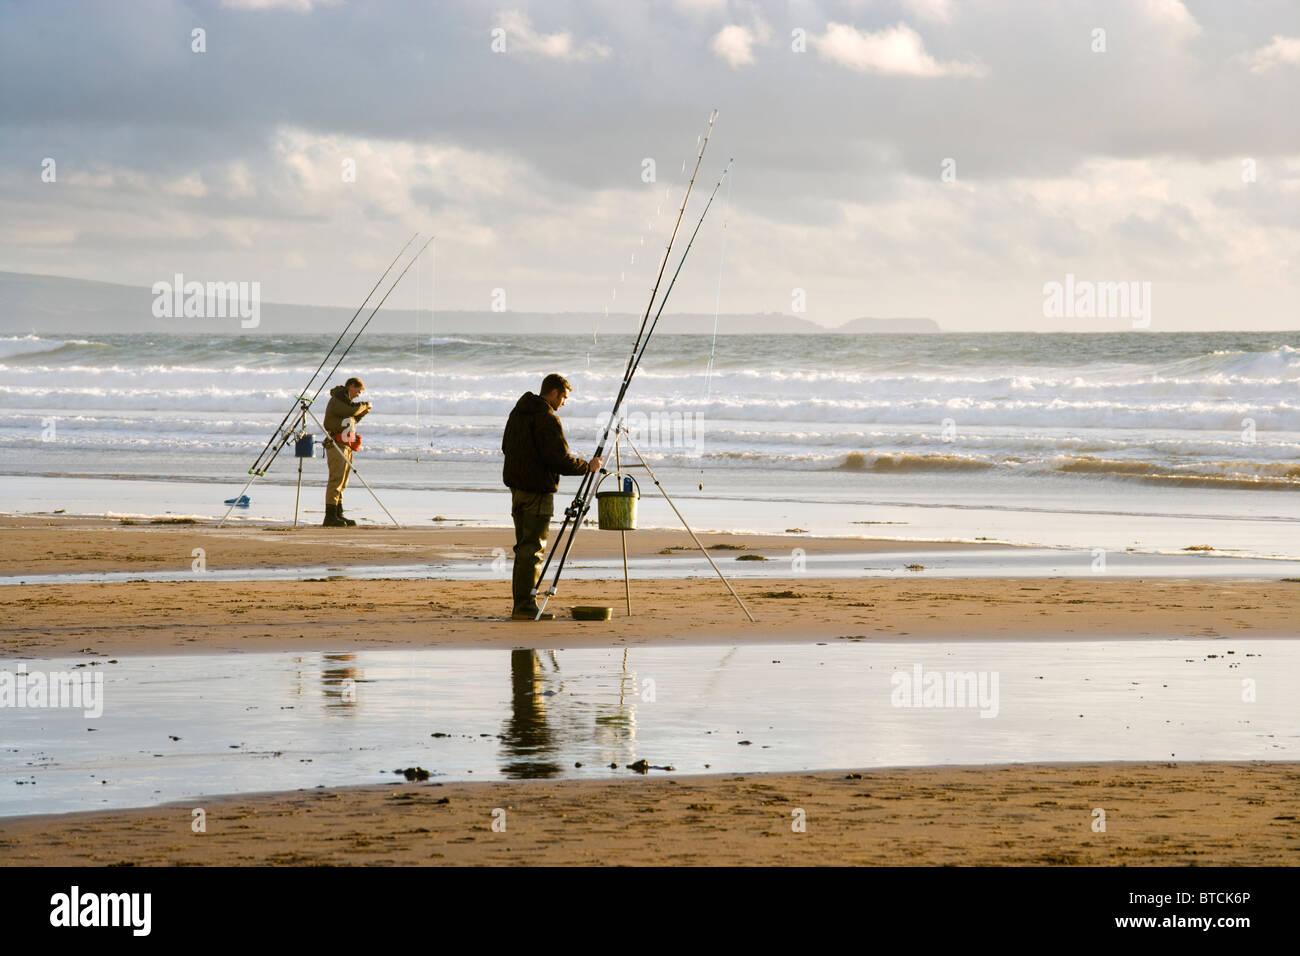 Fishermen at Sandy Mouth near Bude, Cornwall, UK - Stock Image